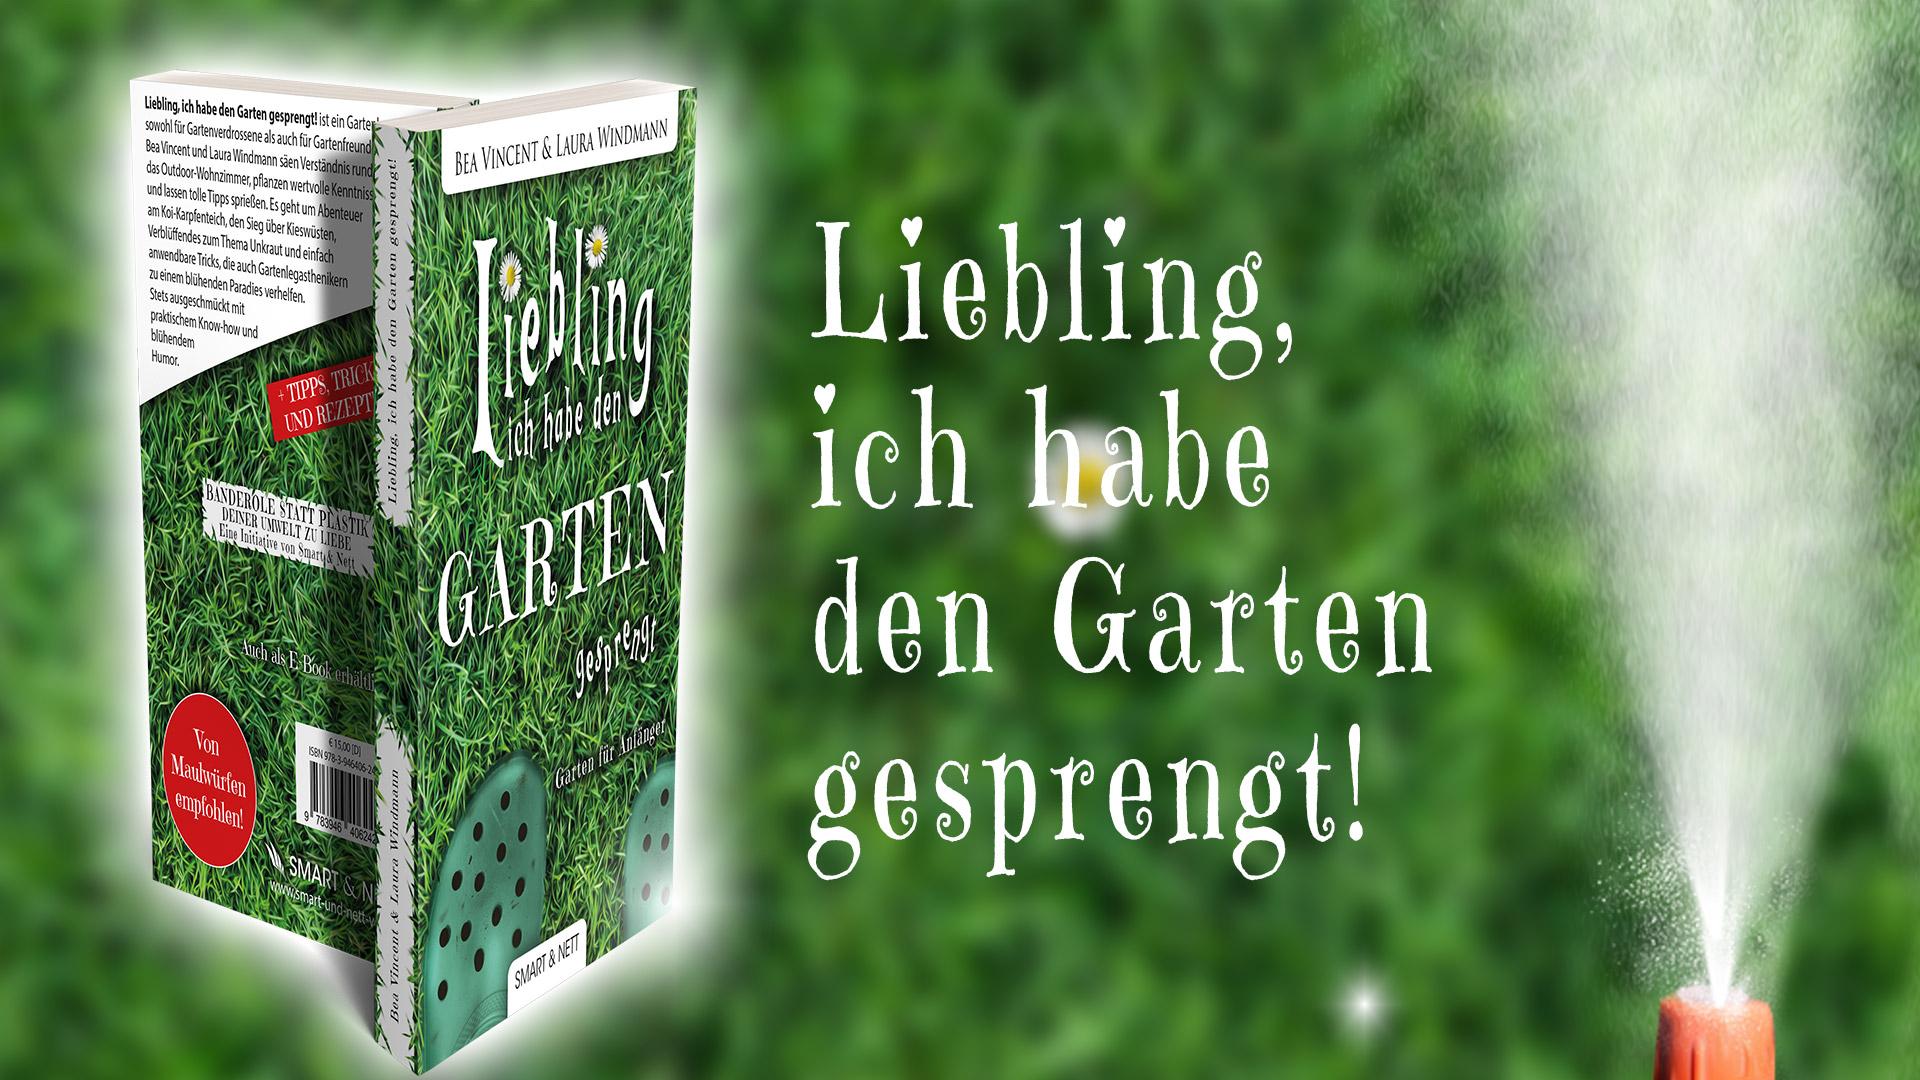 Liebling, ich habe den Garten gesprengt! | Smart & Nett Verlag